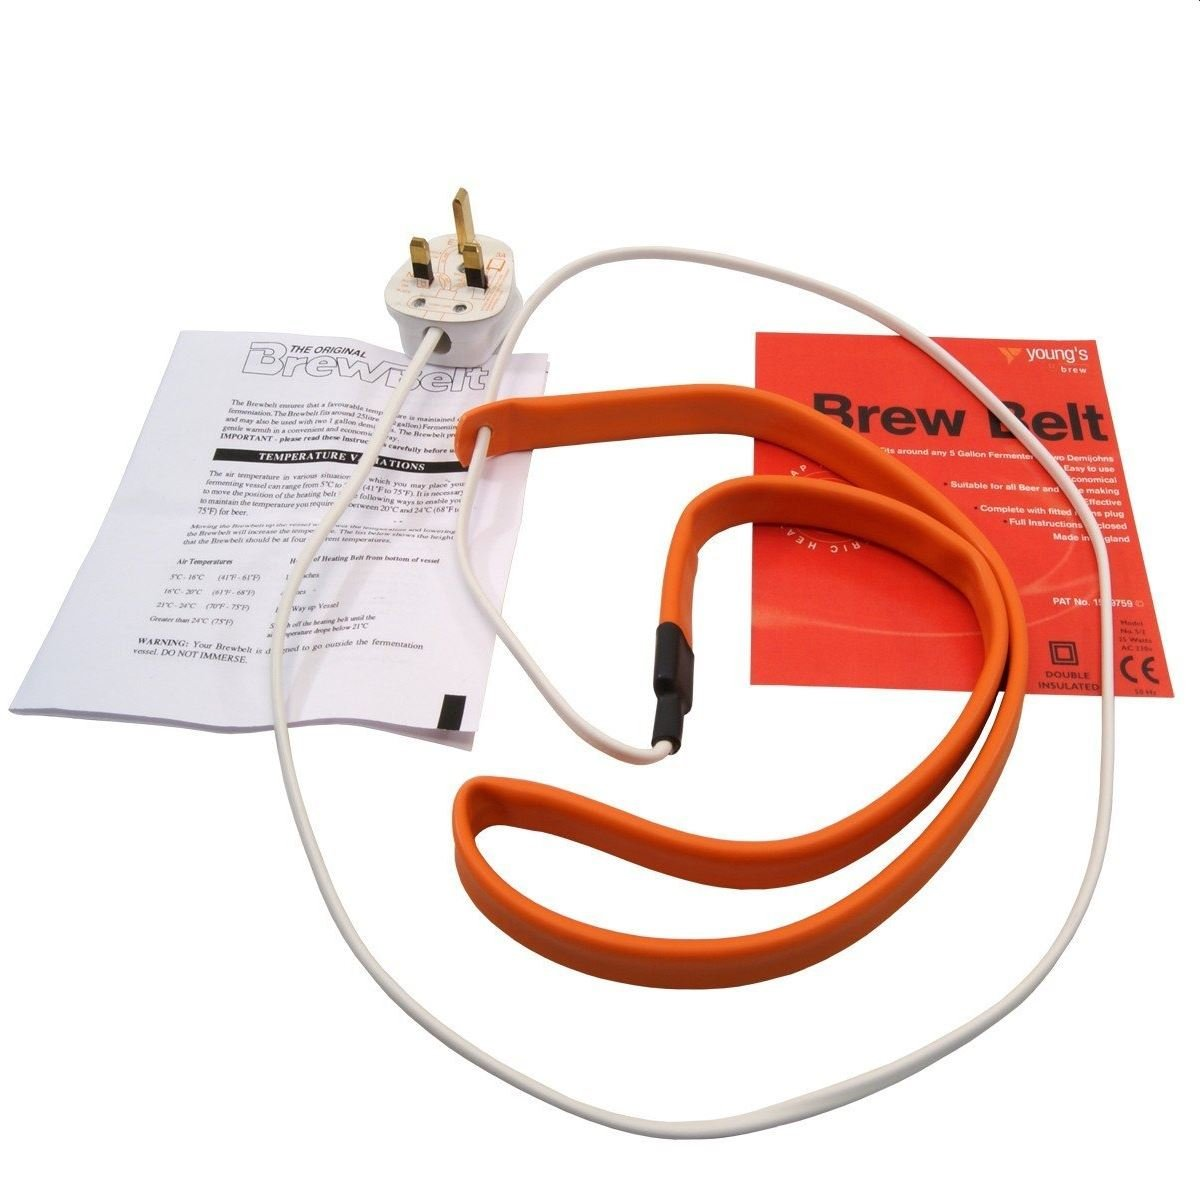 pj homebrew wiring diagram wiring library home brew wine making youngs u brew electric wrap around brew belt heater